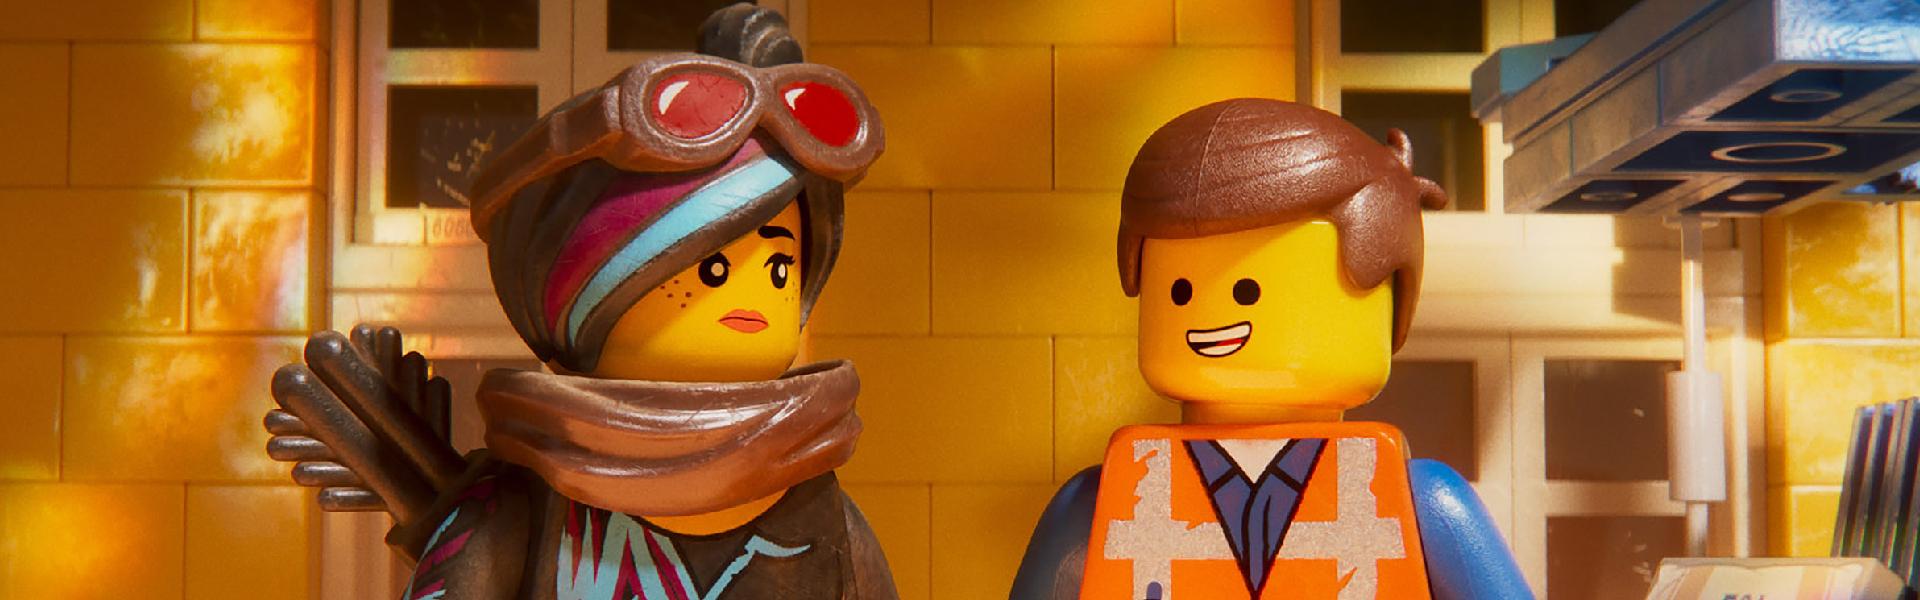 LEGO® PRZYGODA 2 <span>(dubbing)</span>